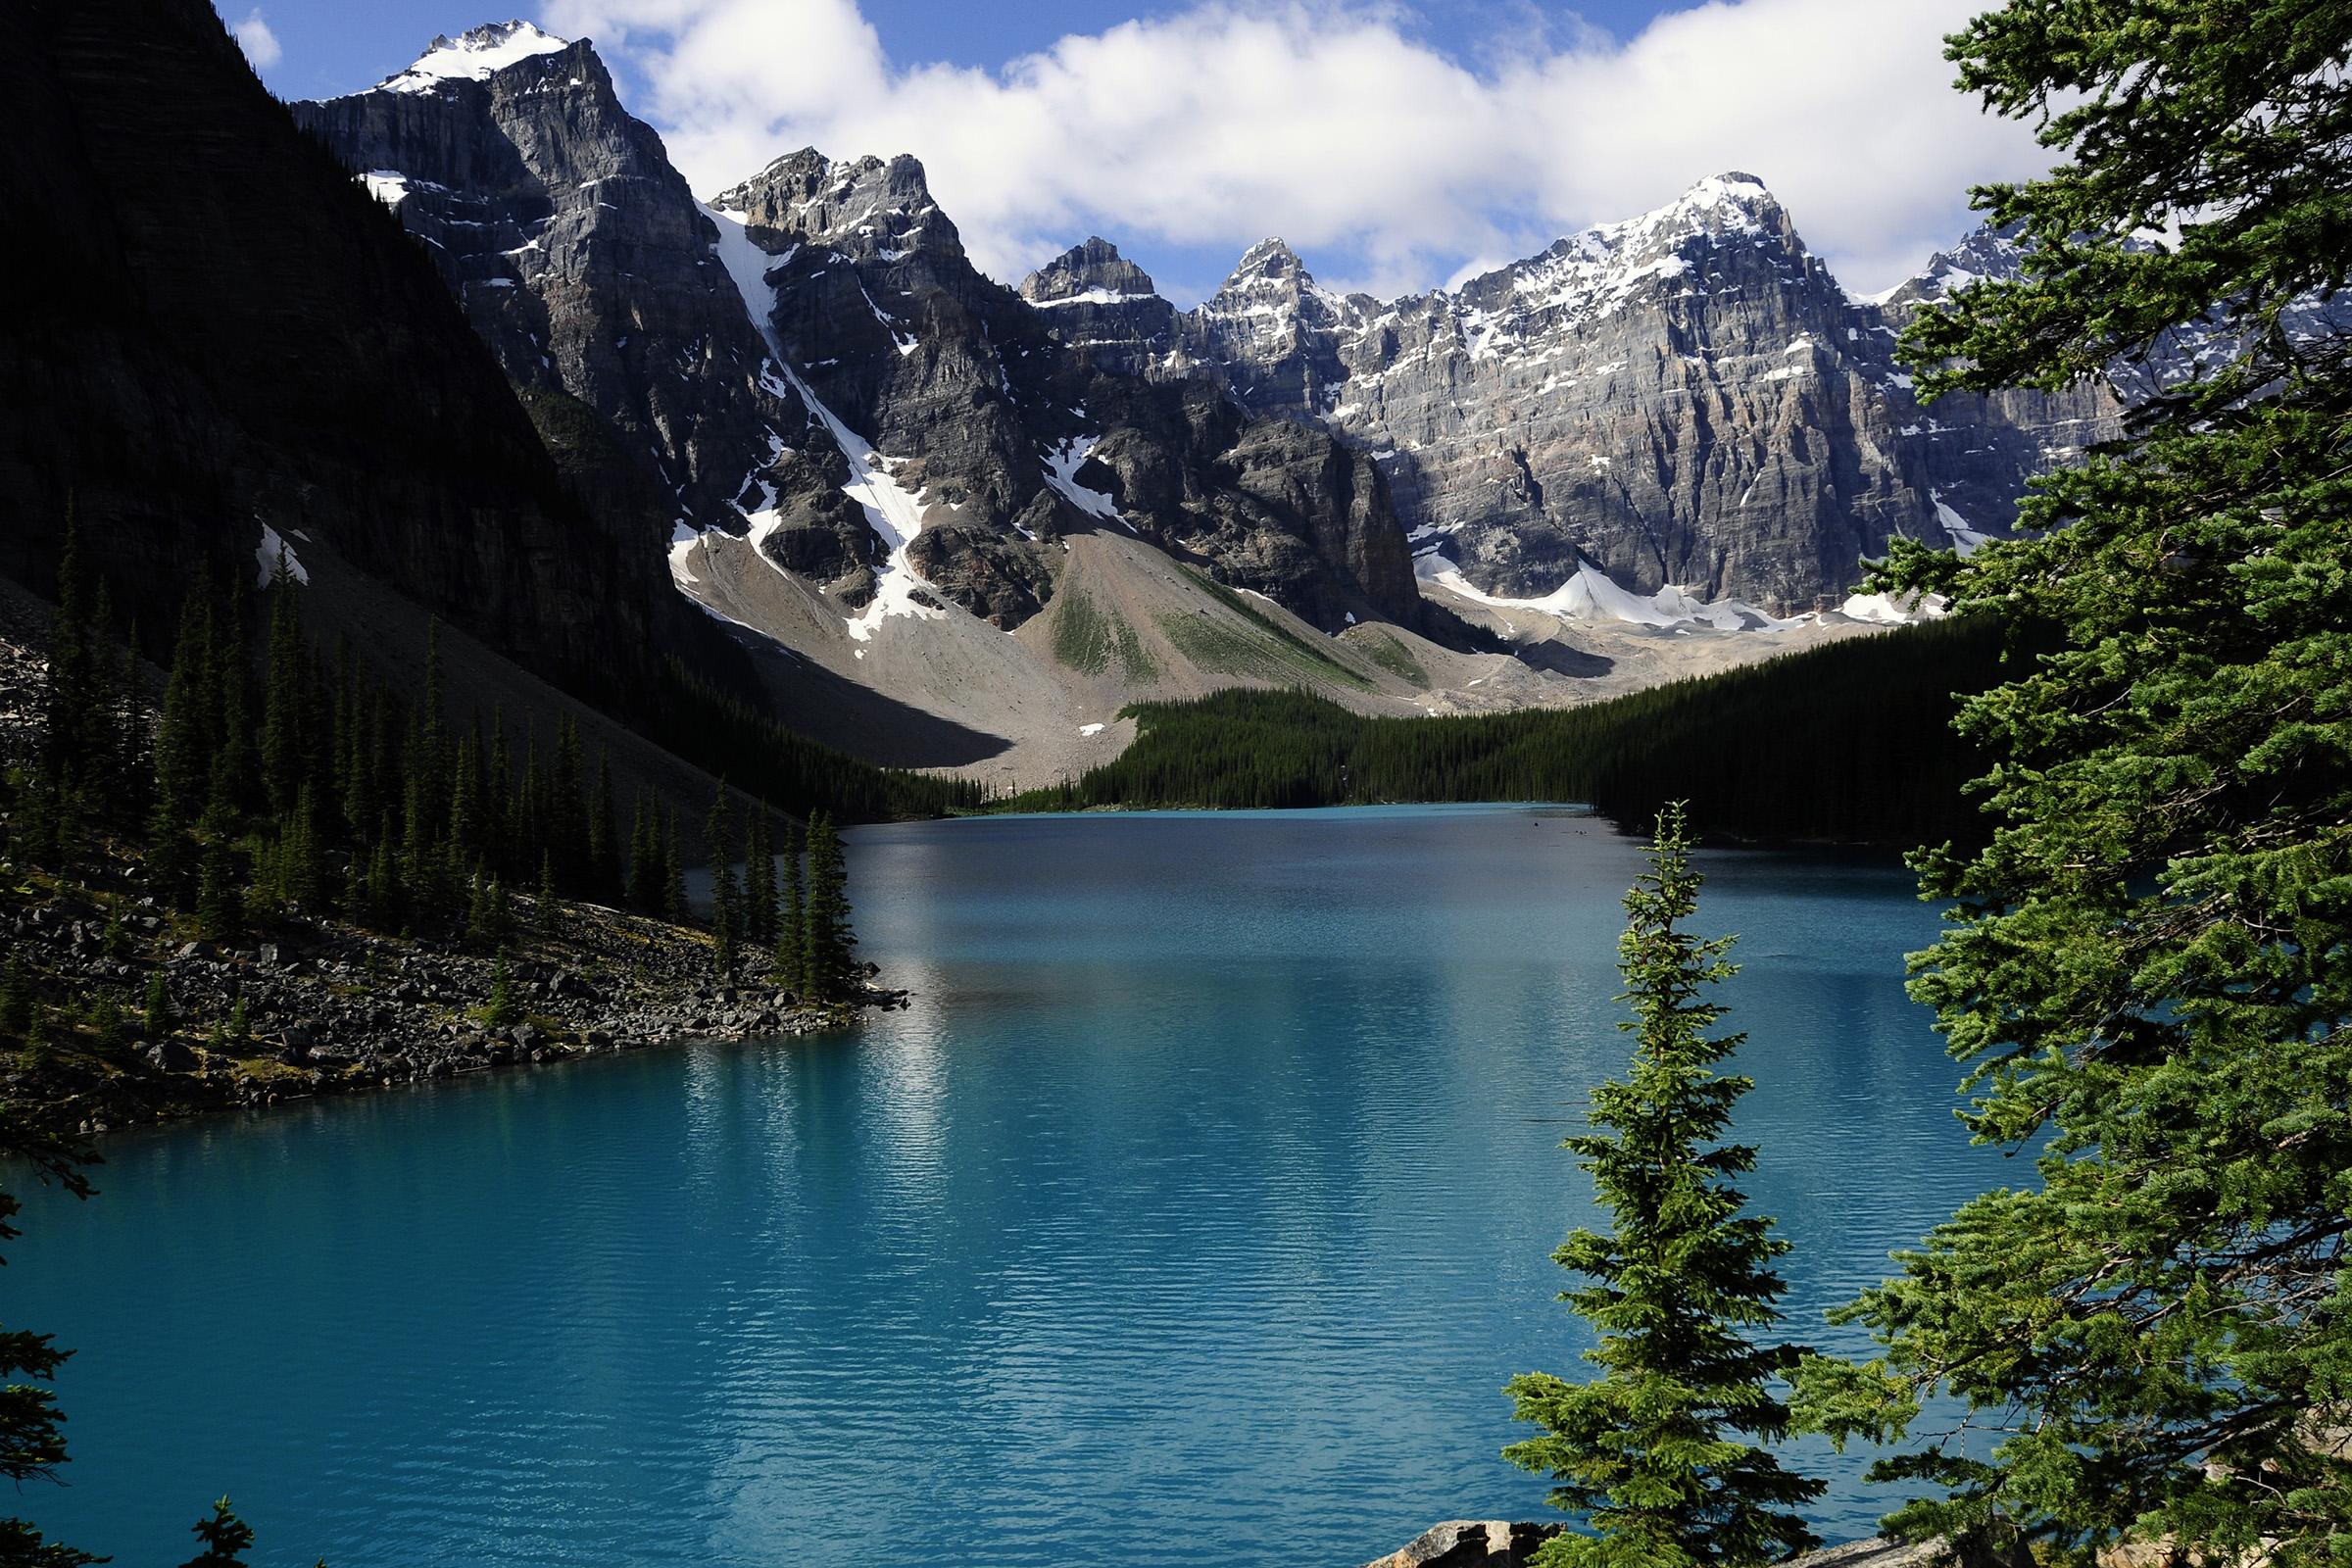 Kanada 2011 (Lake Luise és Yoho NP)